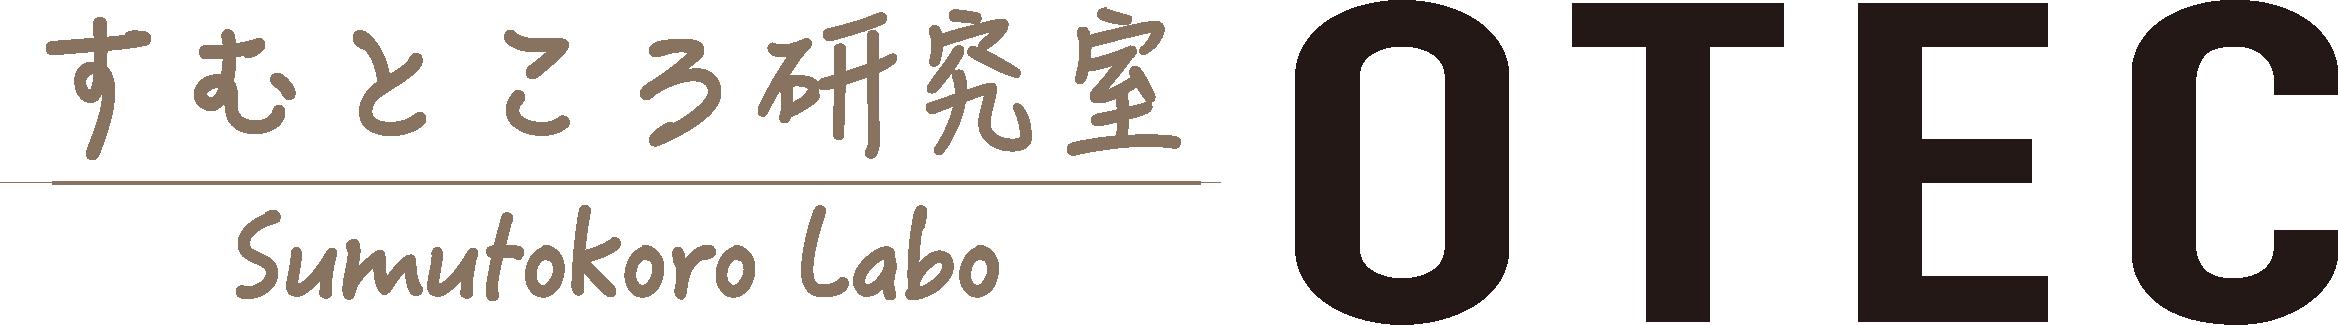 OTEC [株式会社オーテック] 飯田・下伊那地区で新築住宅ならお任せください